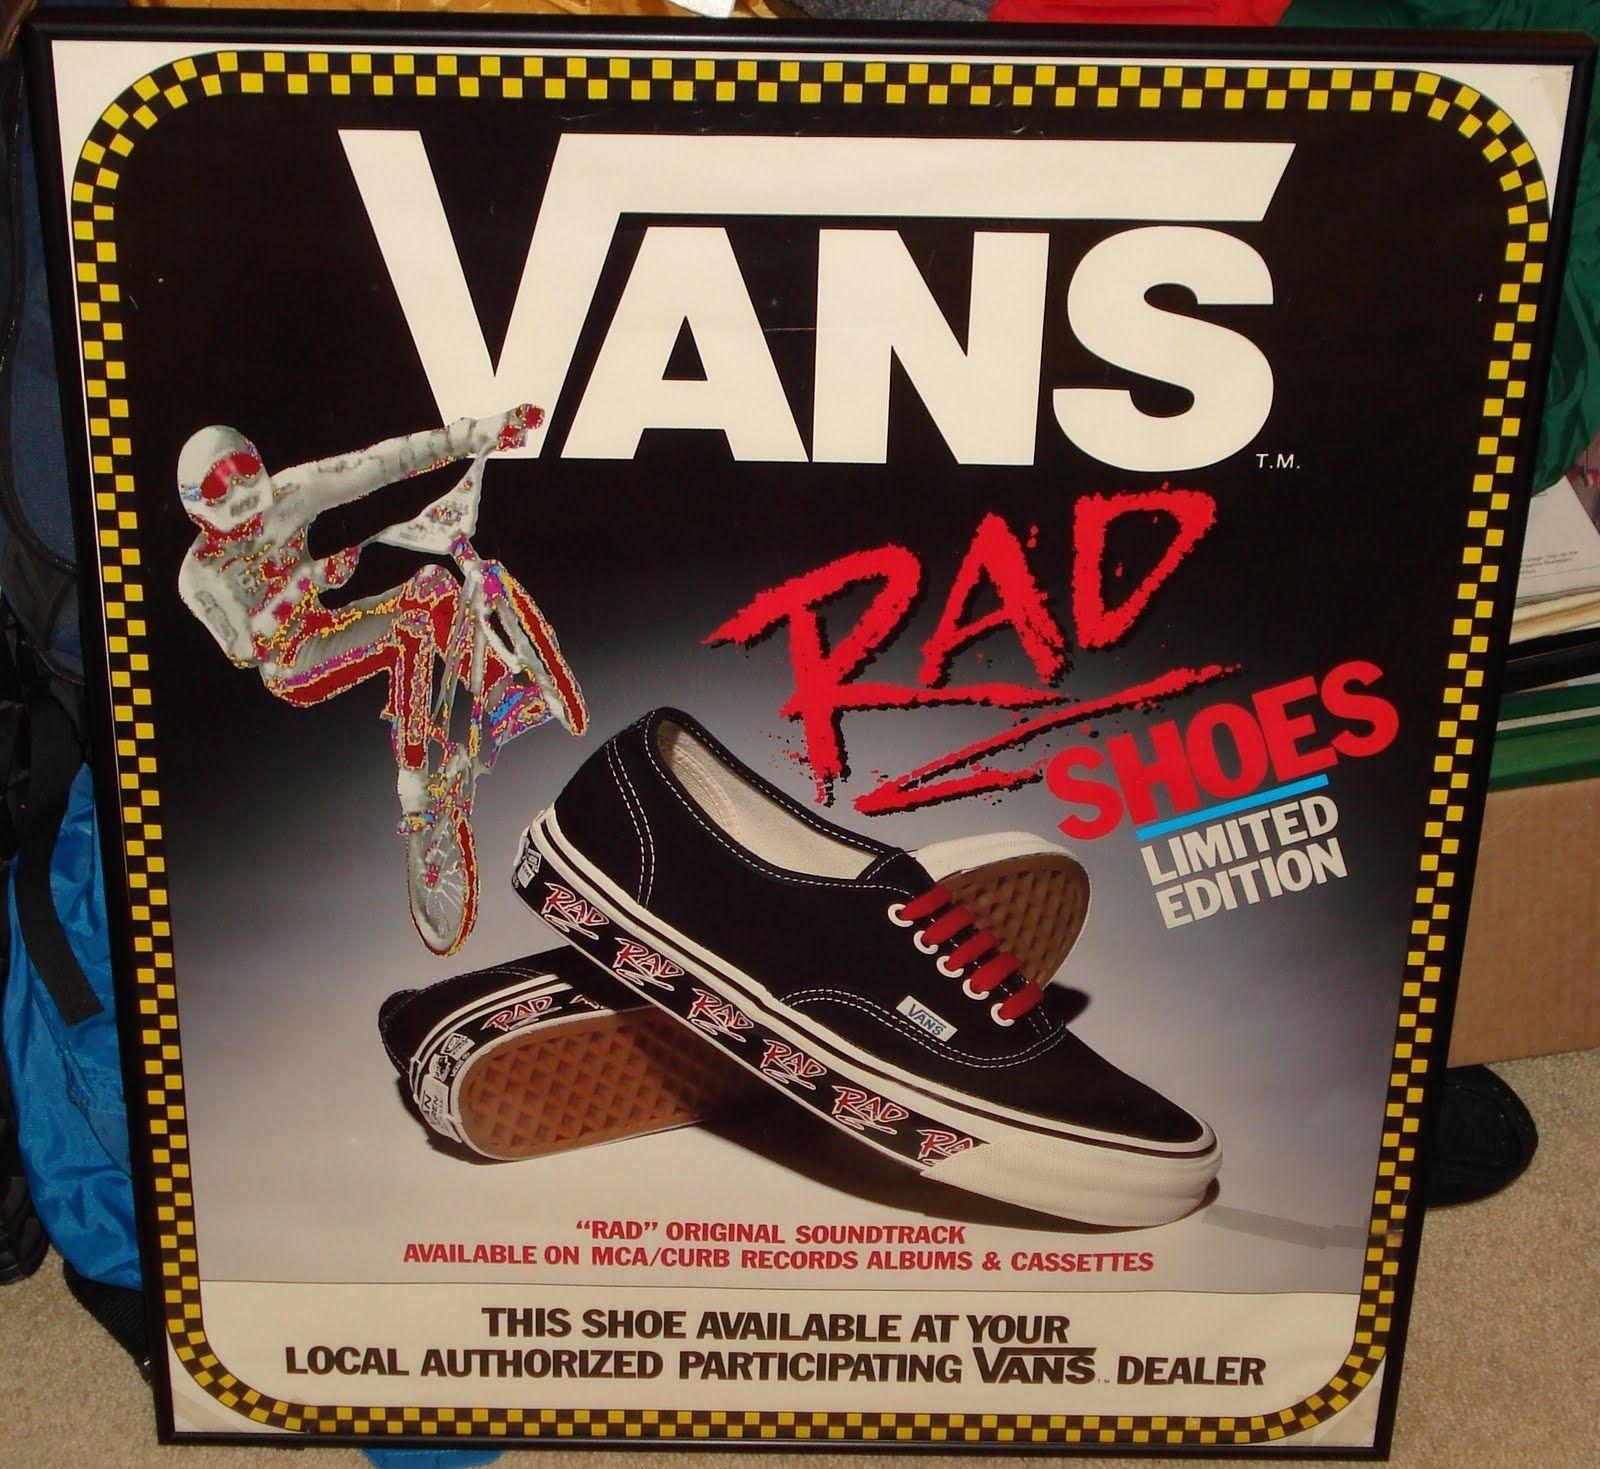 80s stuff | picked up this cool vintage mid 80 s rad vans